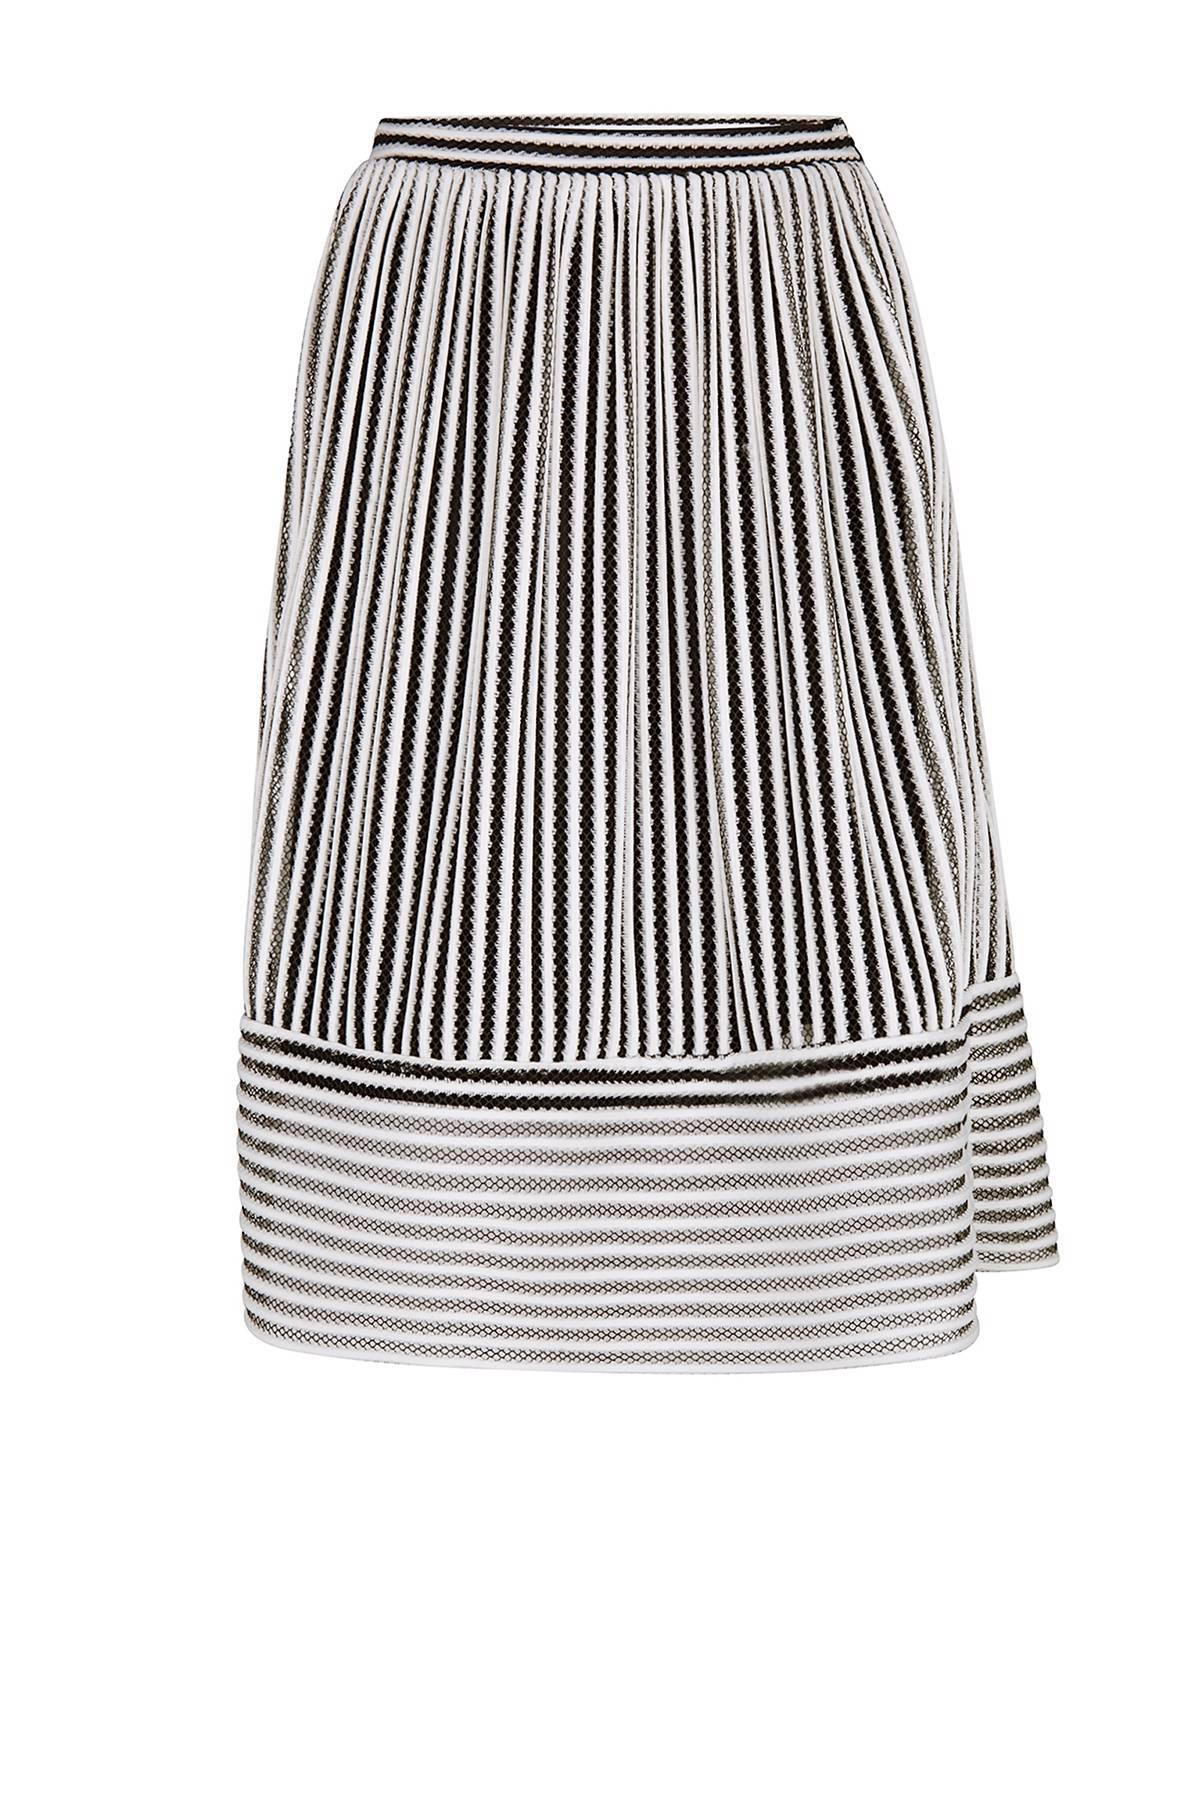 4e157089fd8879 Mid Season Sale WE Fashion tot 50% bij wehkamp - Gratis bezorging vanaf 20.-